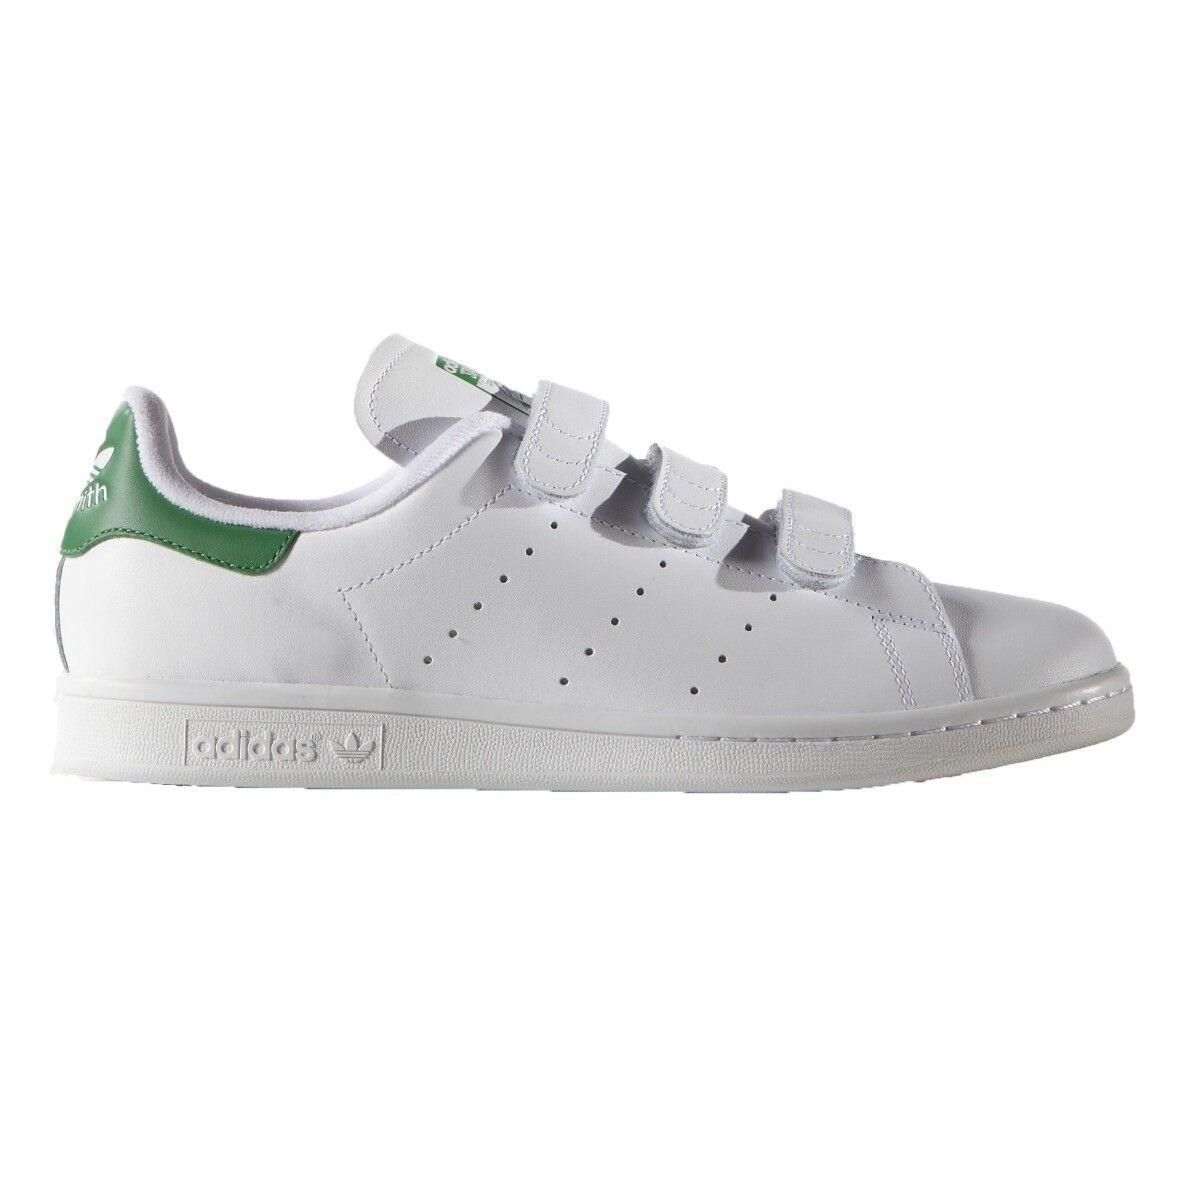 Adidas / Glenbuck Spezial SPZL Trainers / Adidas Baskets DA8758 Gr. 41 1/3  45 1/3 Neu df6282